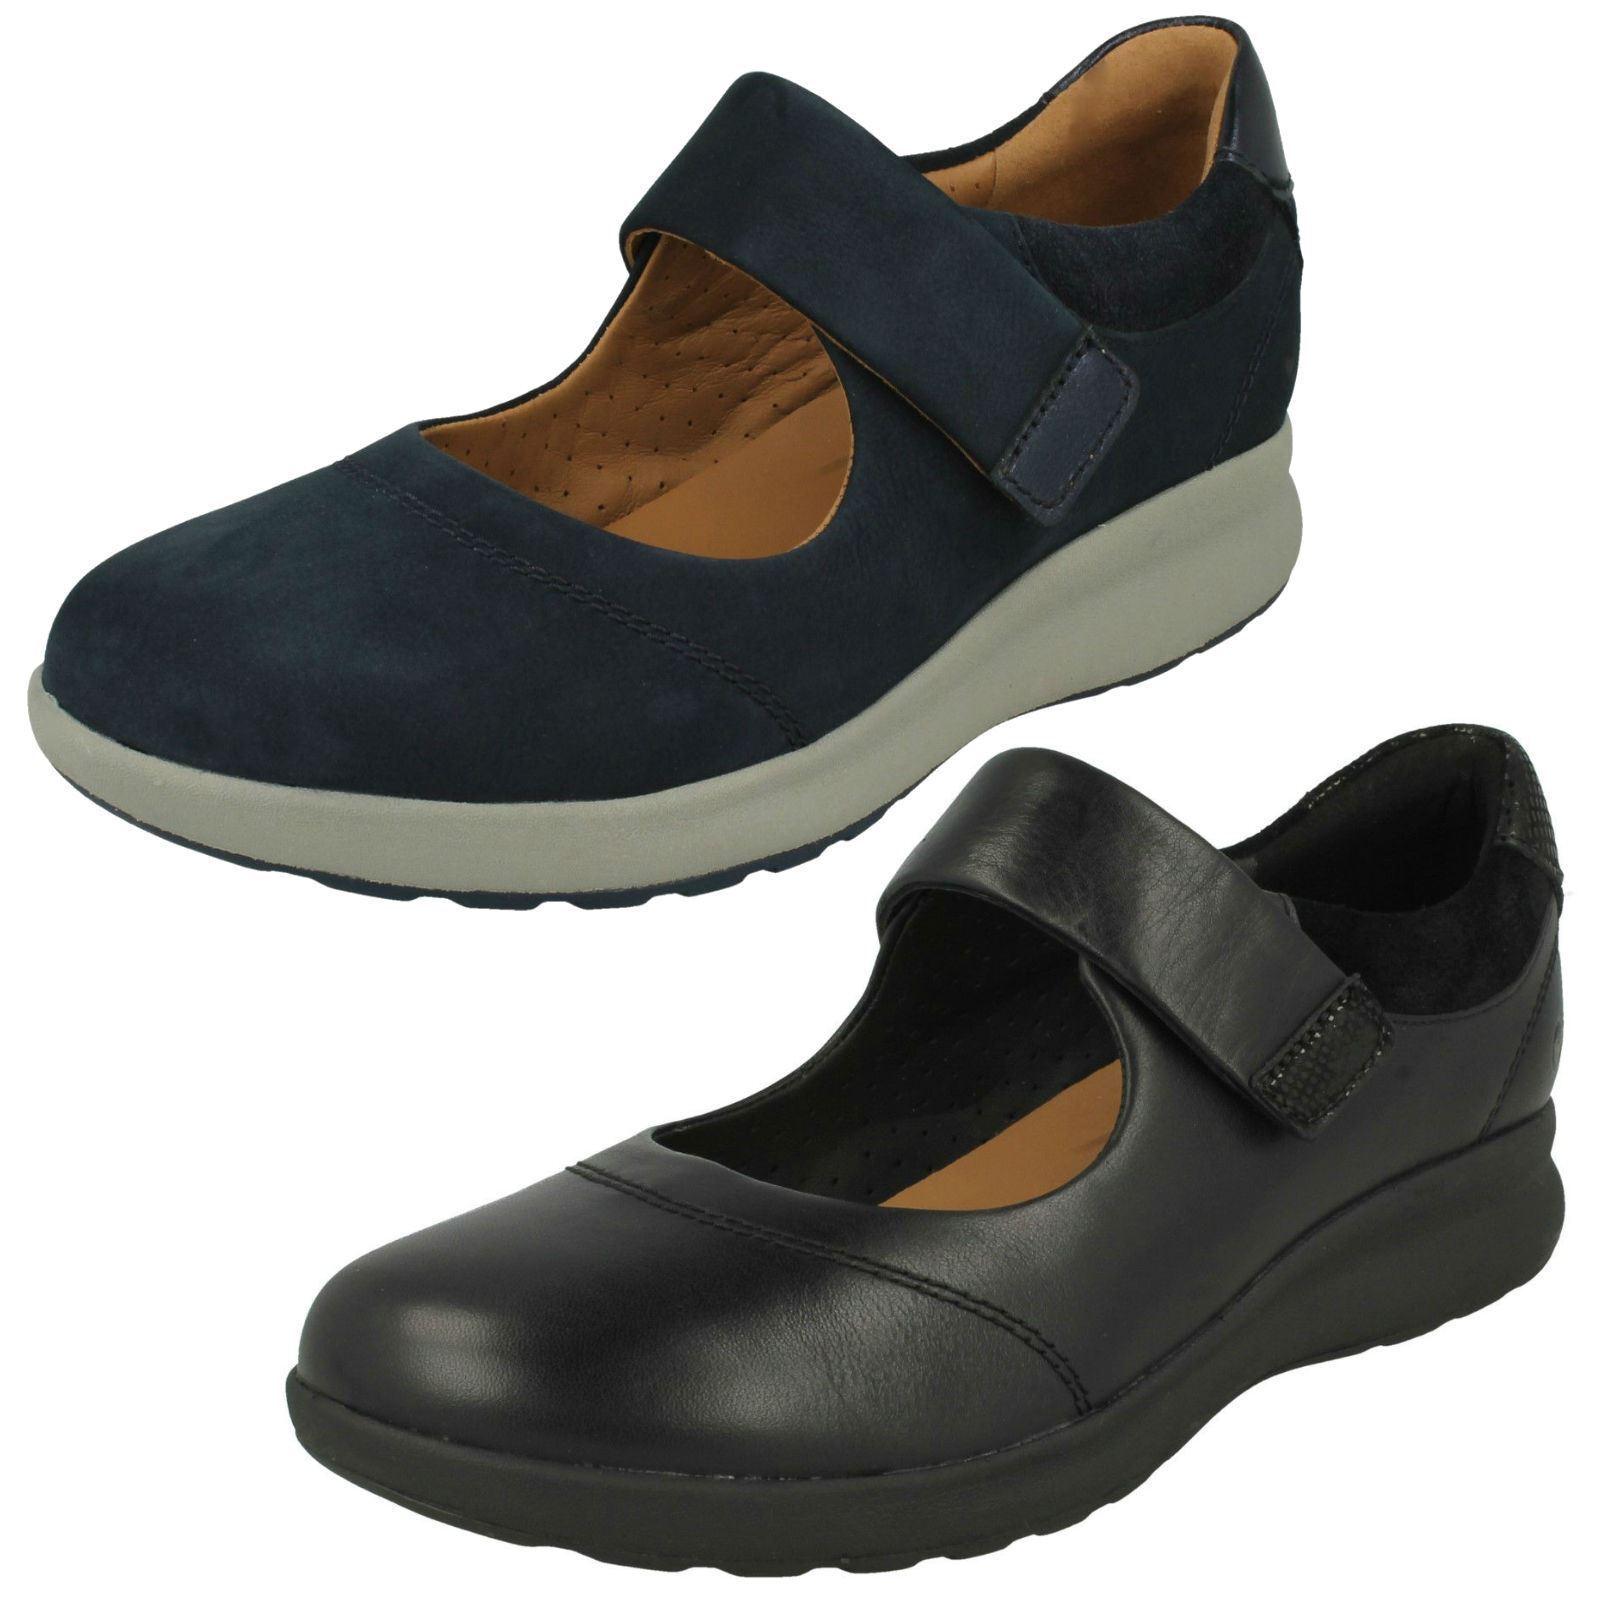 Ladies Clarks Casual Flat Mary Jane scarpe - Un Adorn  Strap  acquista online oggi